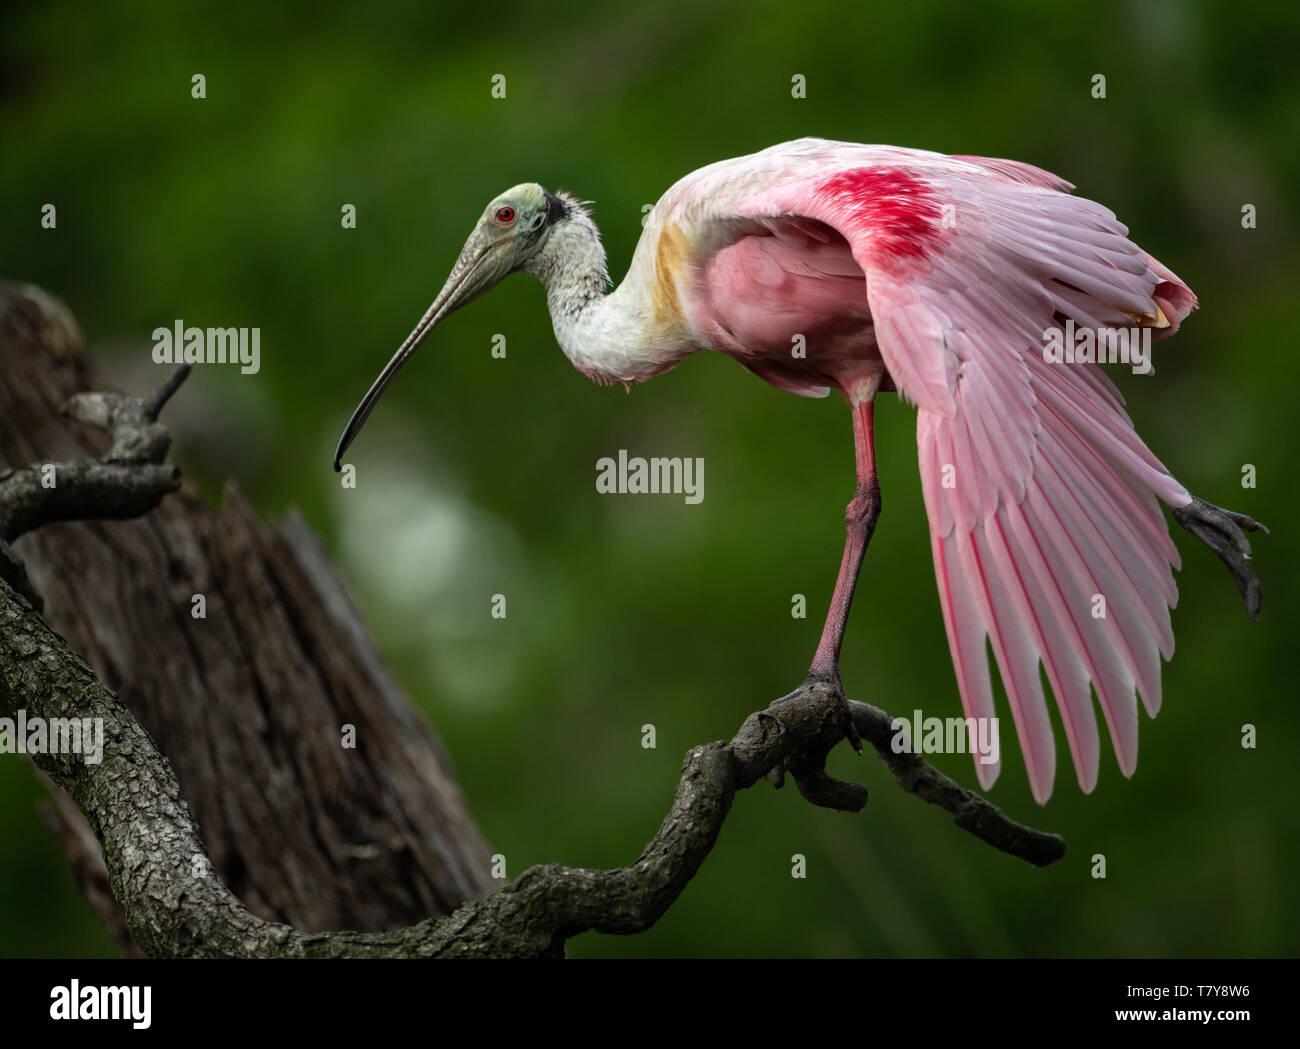 Roseate Spoonbill in Florida - Stock Image